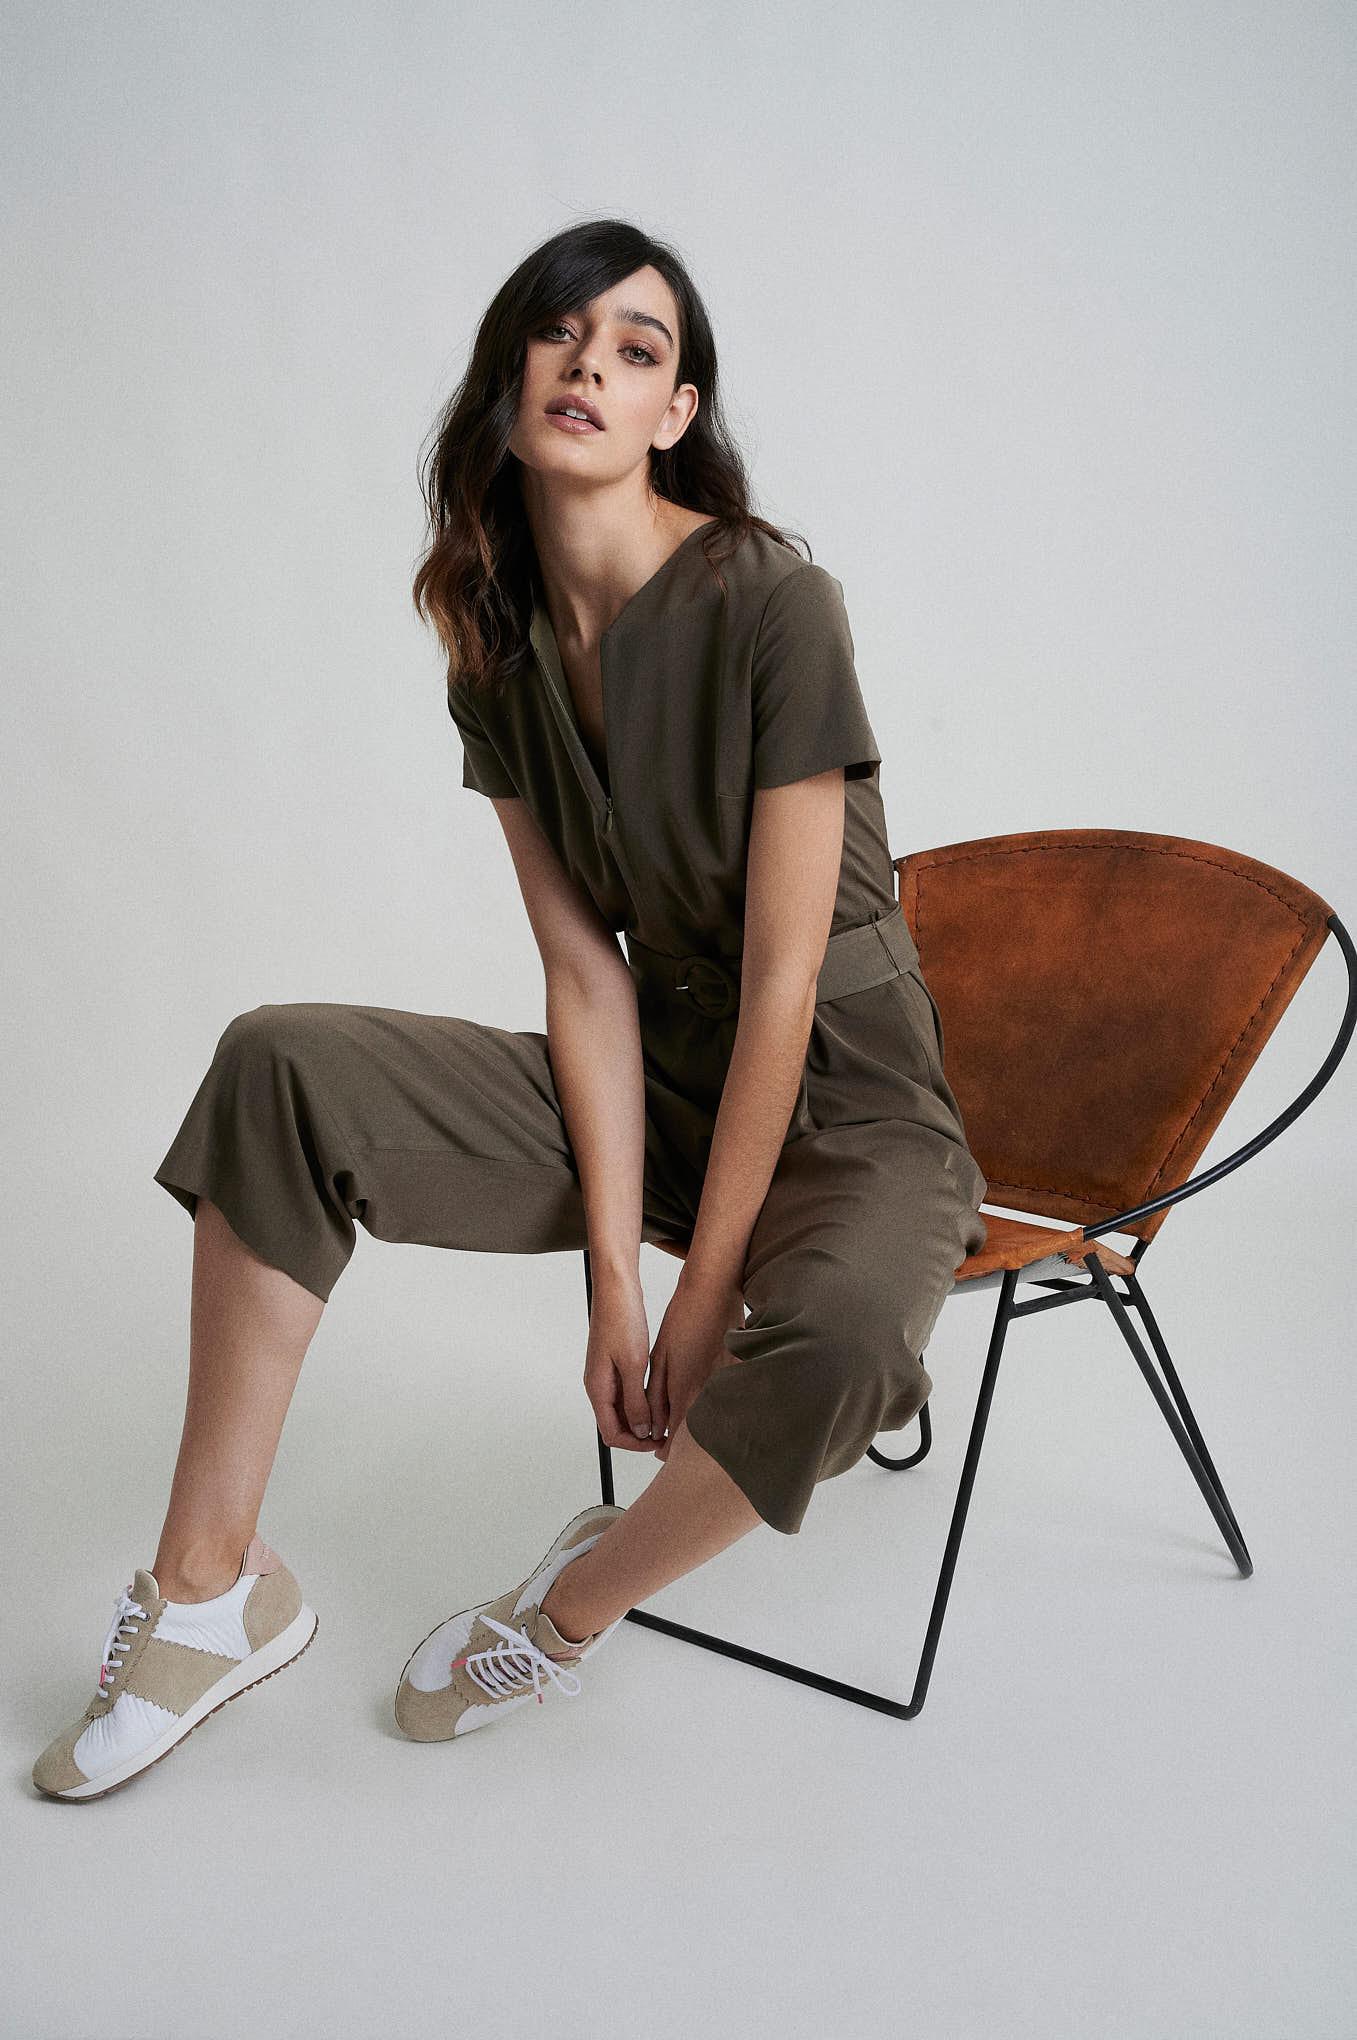 Jumpsuit Khaki Fantasy Woman